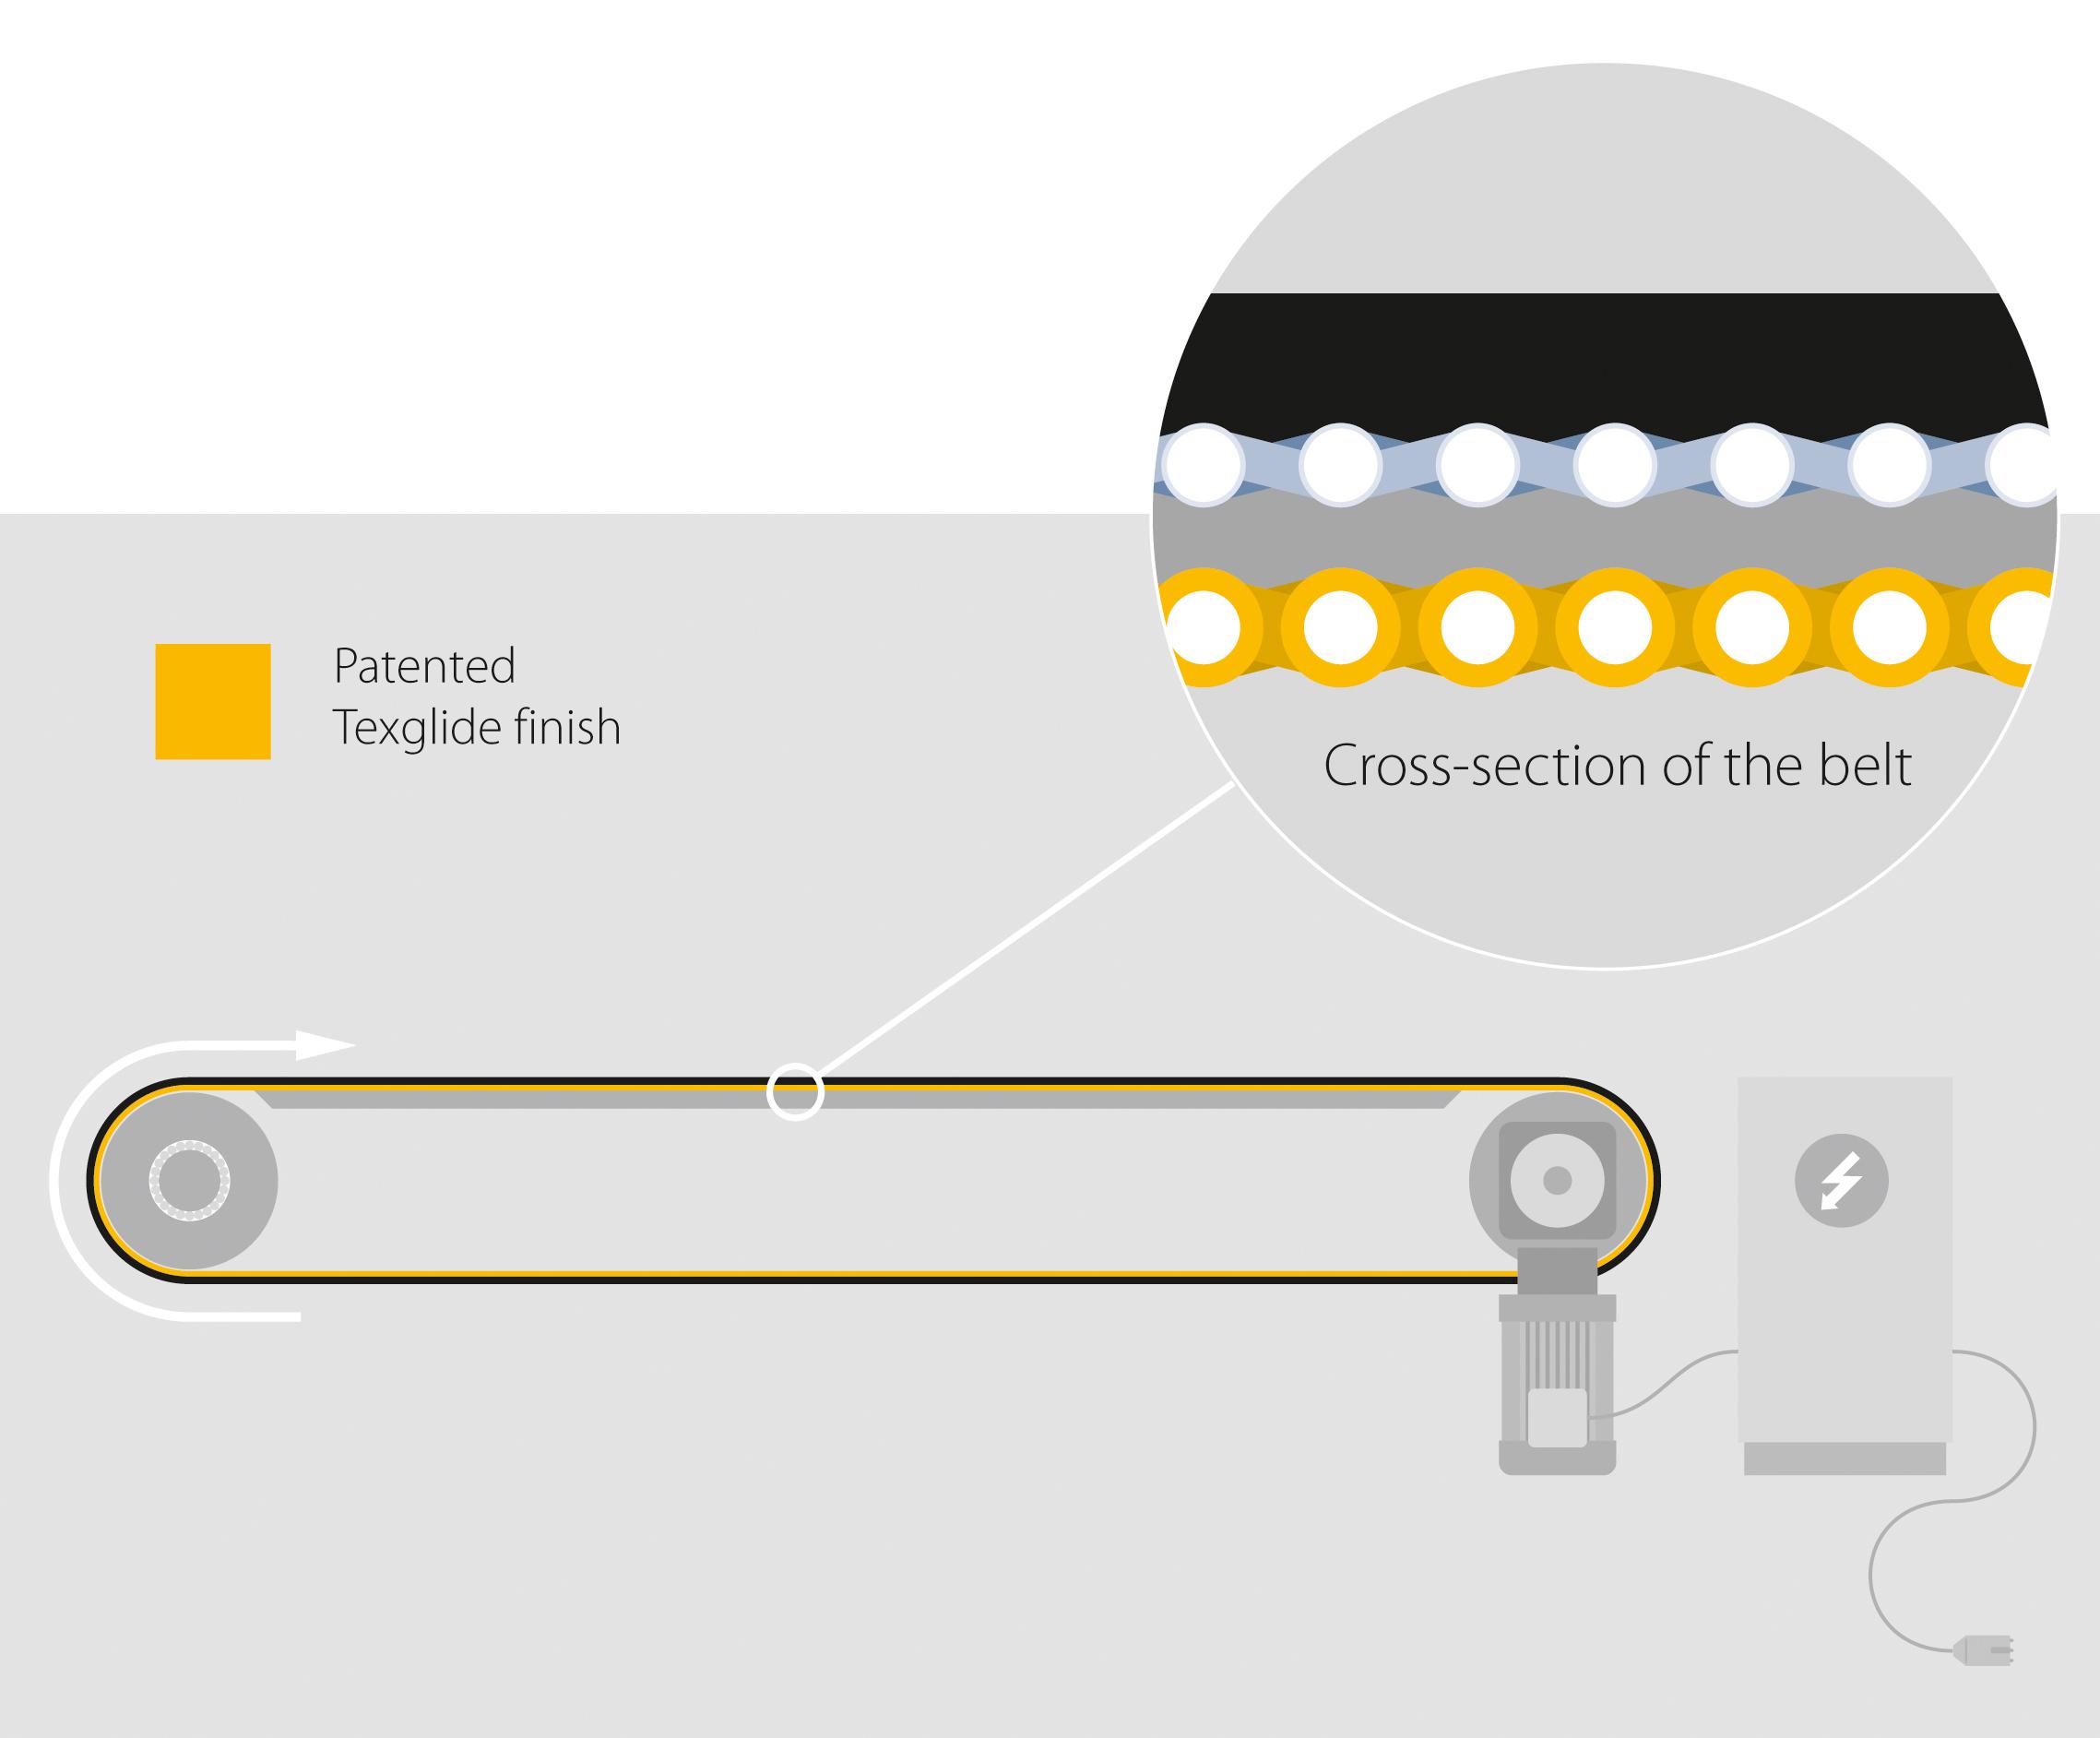 Amp Miser 2 0 New Generation Of Conveyor Belts Enables